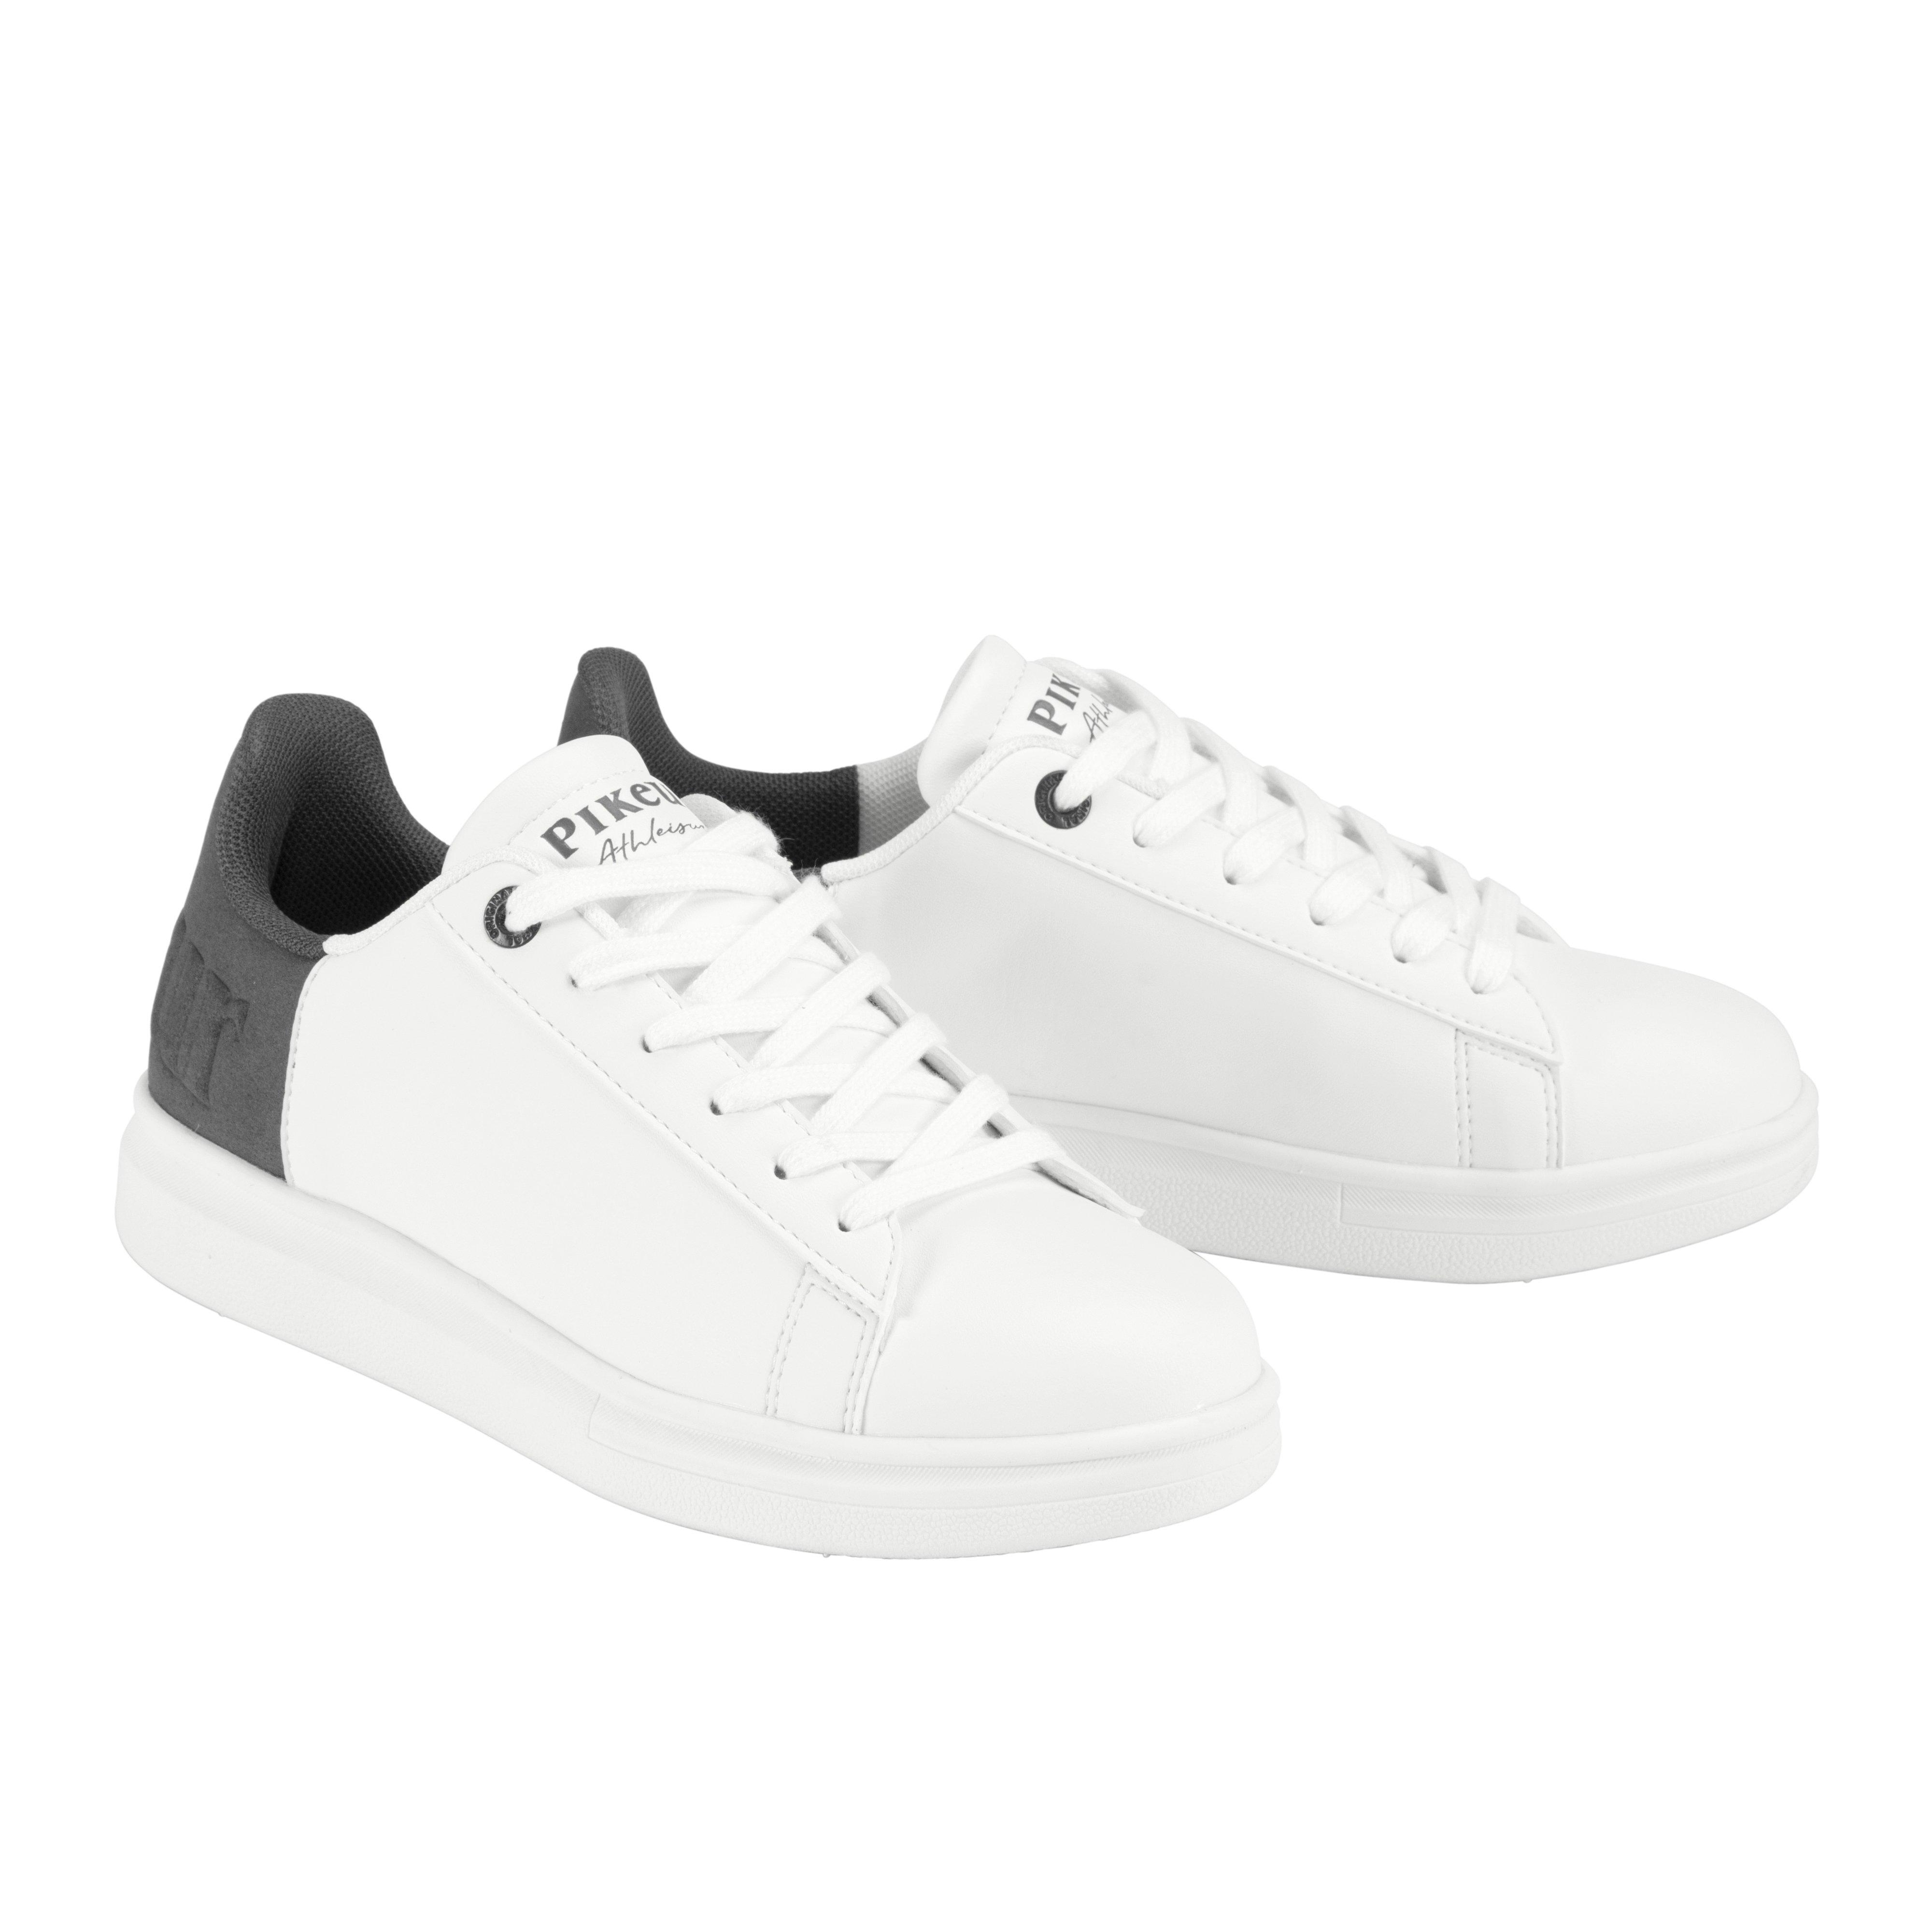 Pikeur Lia Velour Sneaker - Hvid/Grå